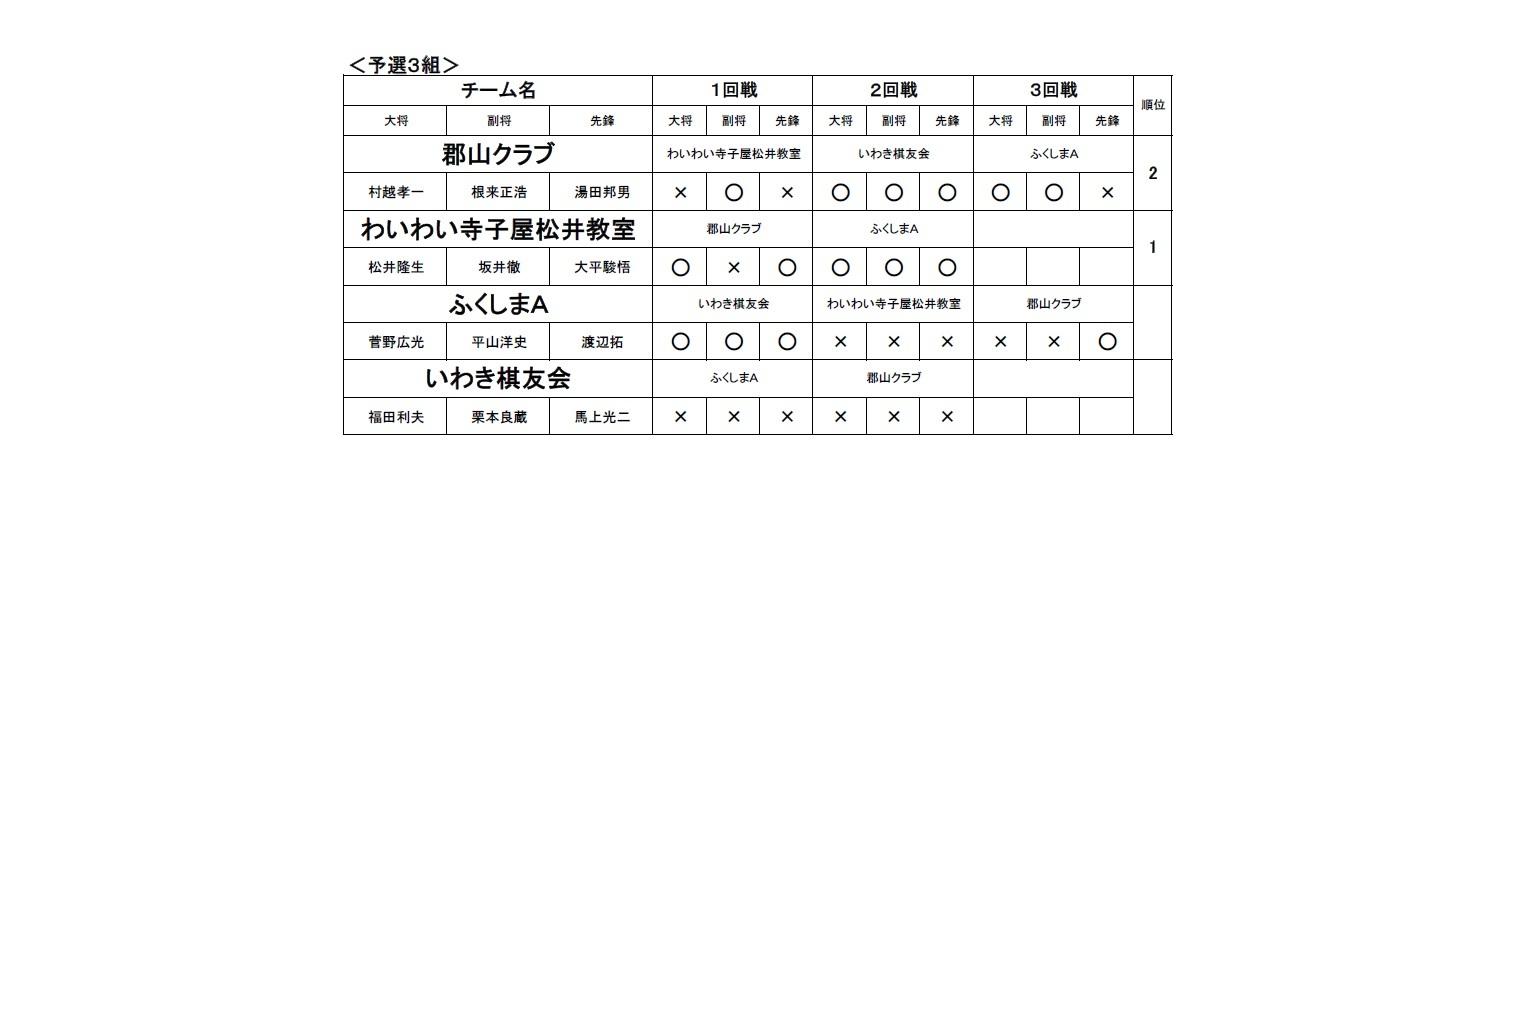 yosen_A_2_20190714.jpg